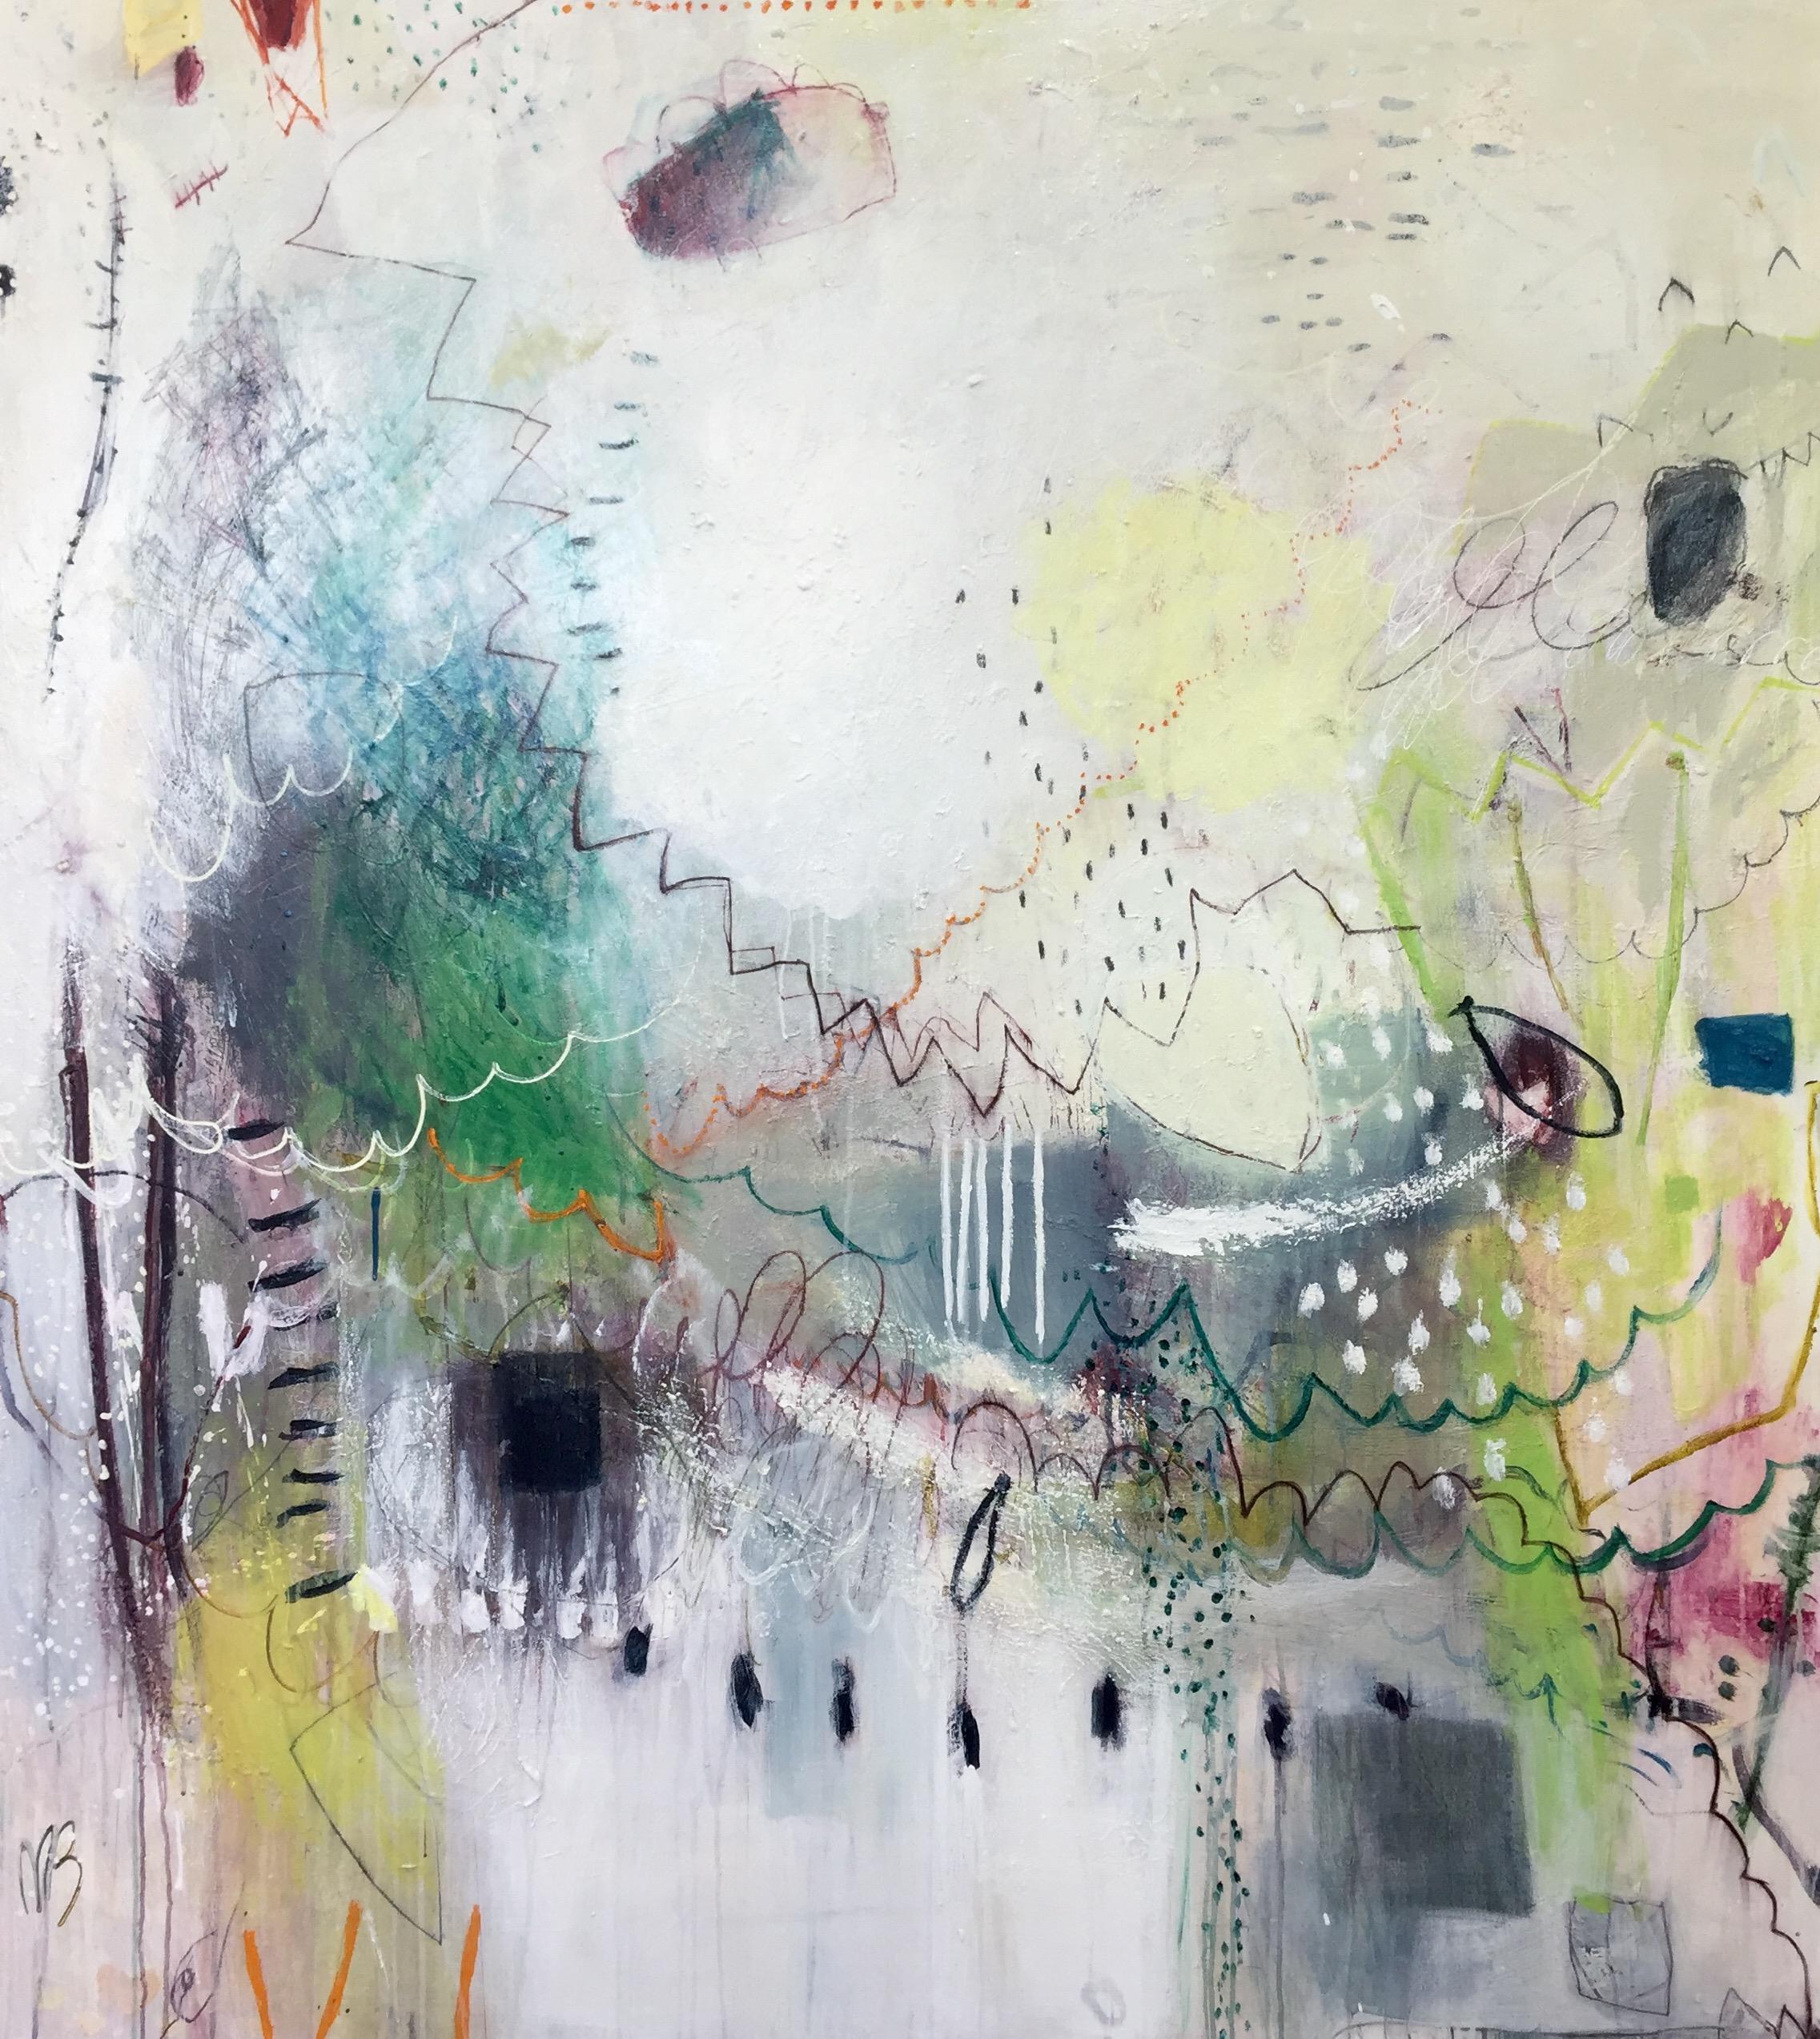 Michelle Breton,  Madame Bouchard Bosquet,  Acrylic on Canvas, 173 x 152cm, $12,000